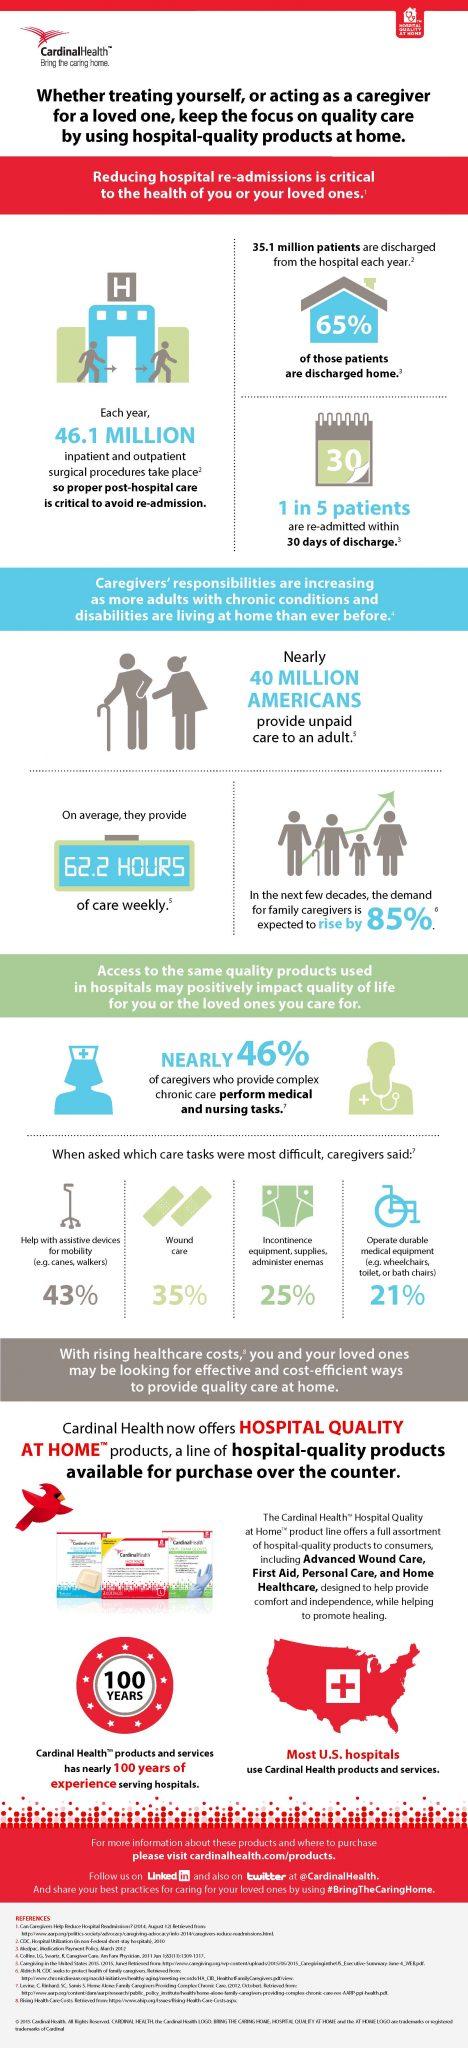 Cardinal Health HQAH Infographic